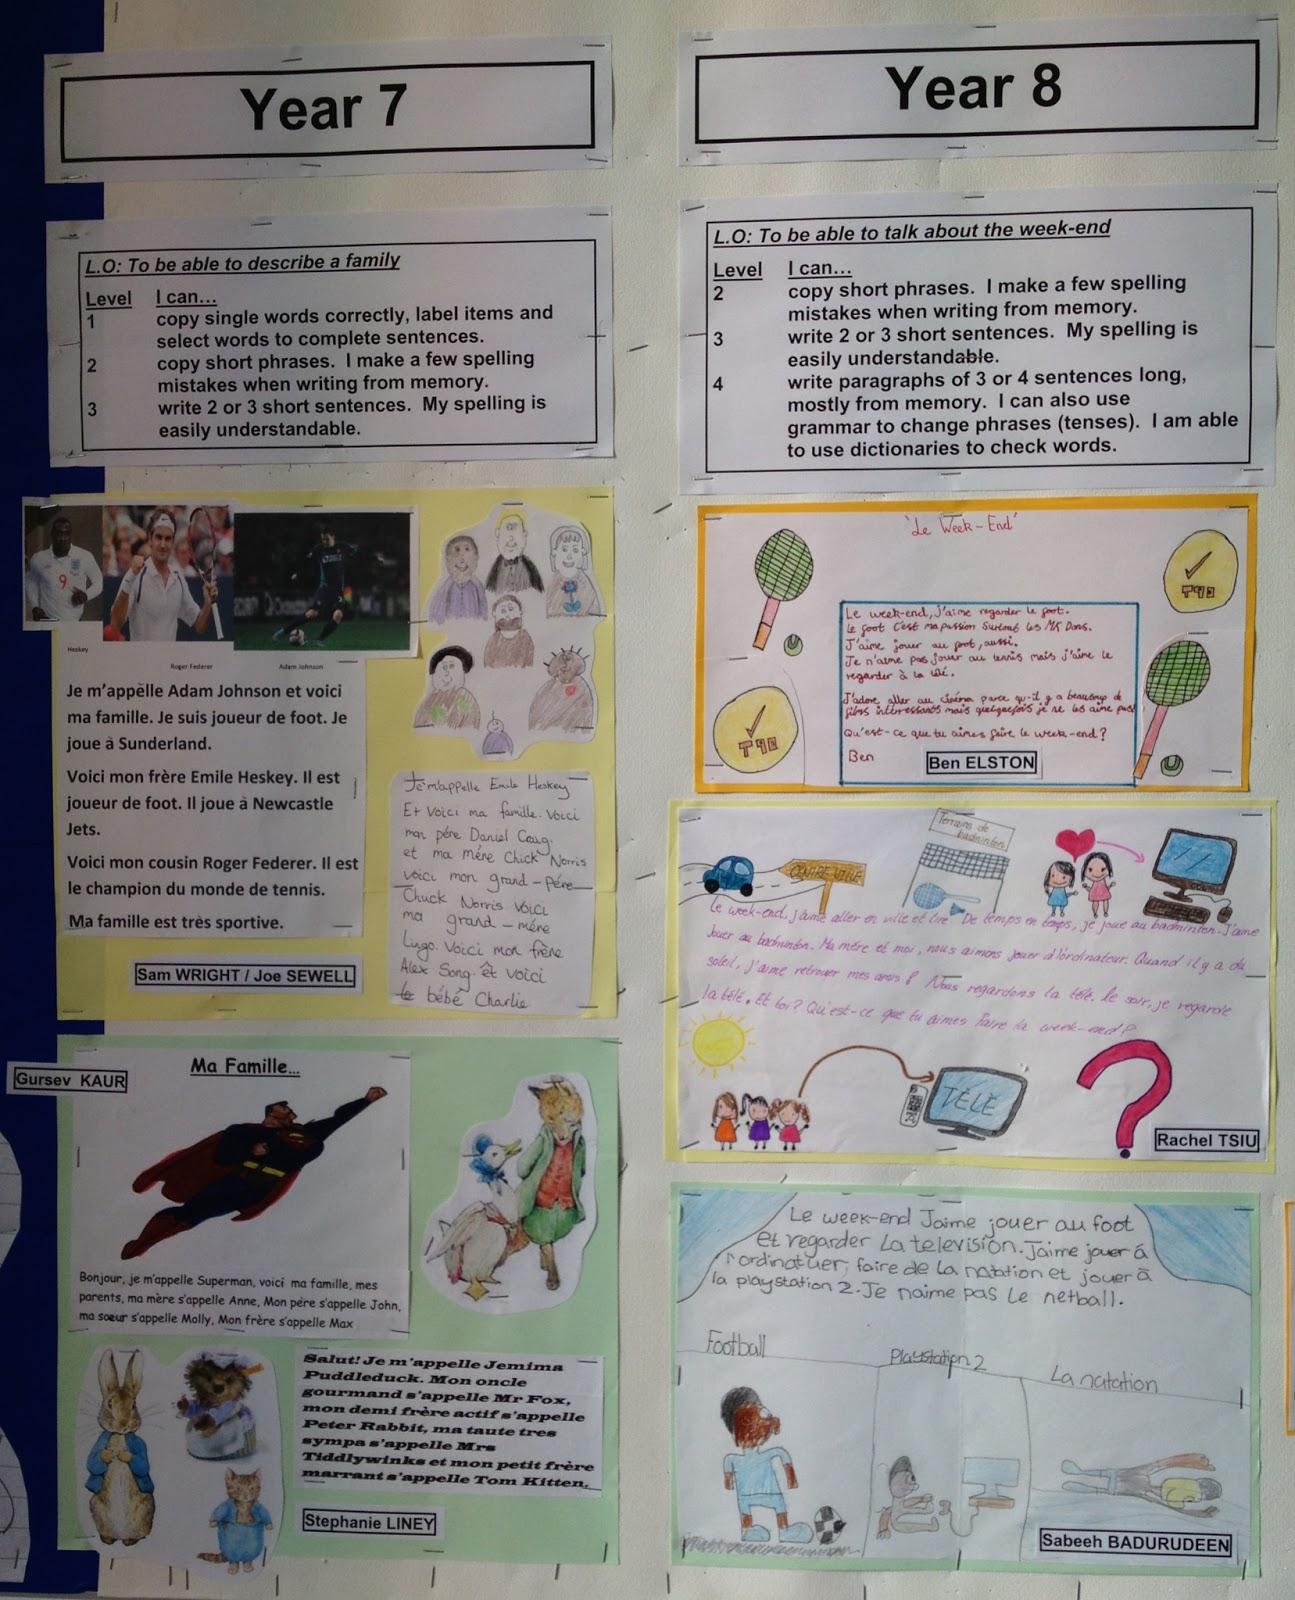 Modern Language Classroom Displays : Wis modern foreign languages new classroom displays in room